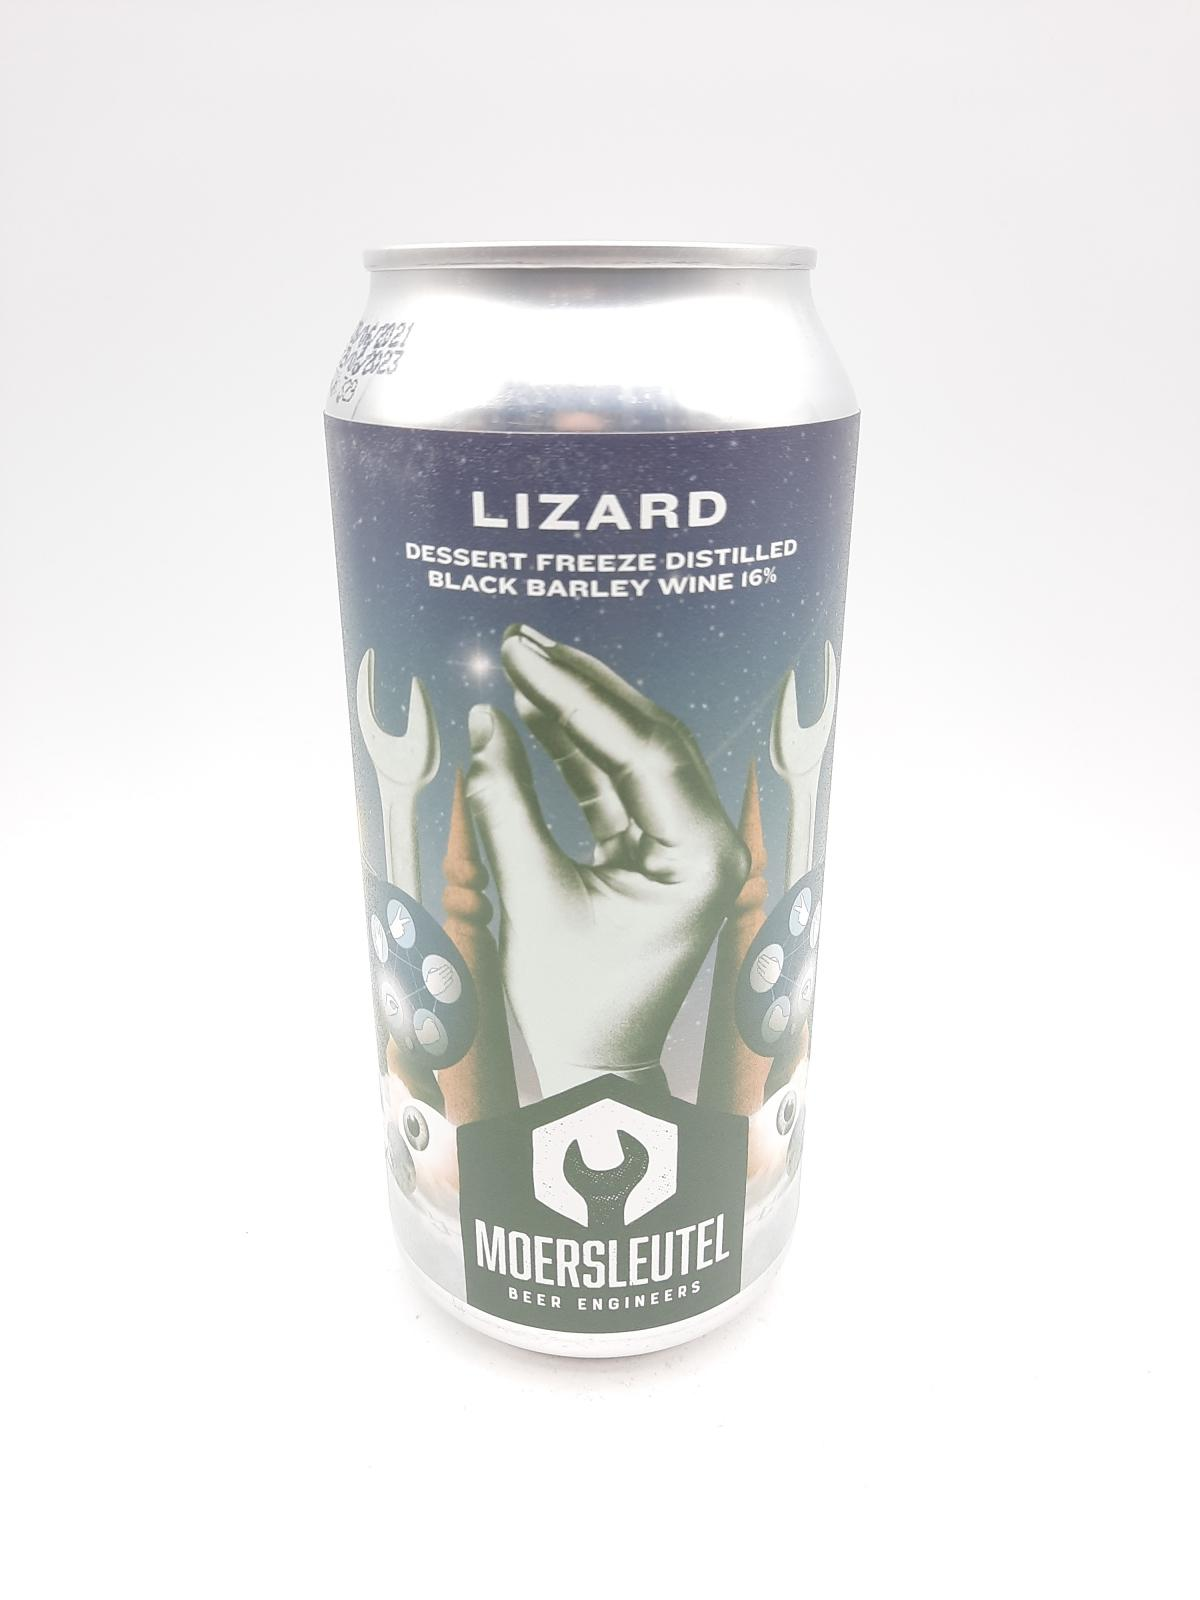 Image Lizard